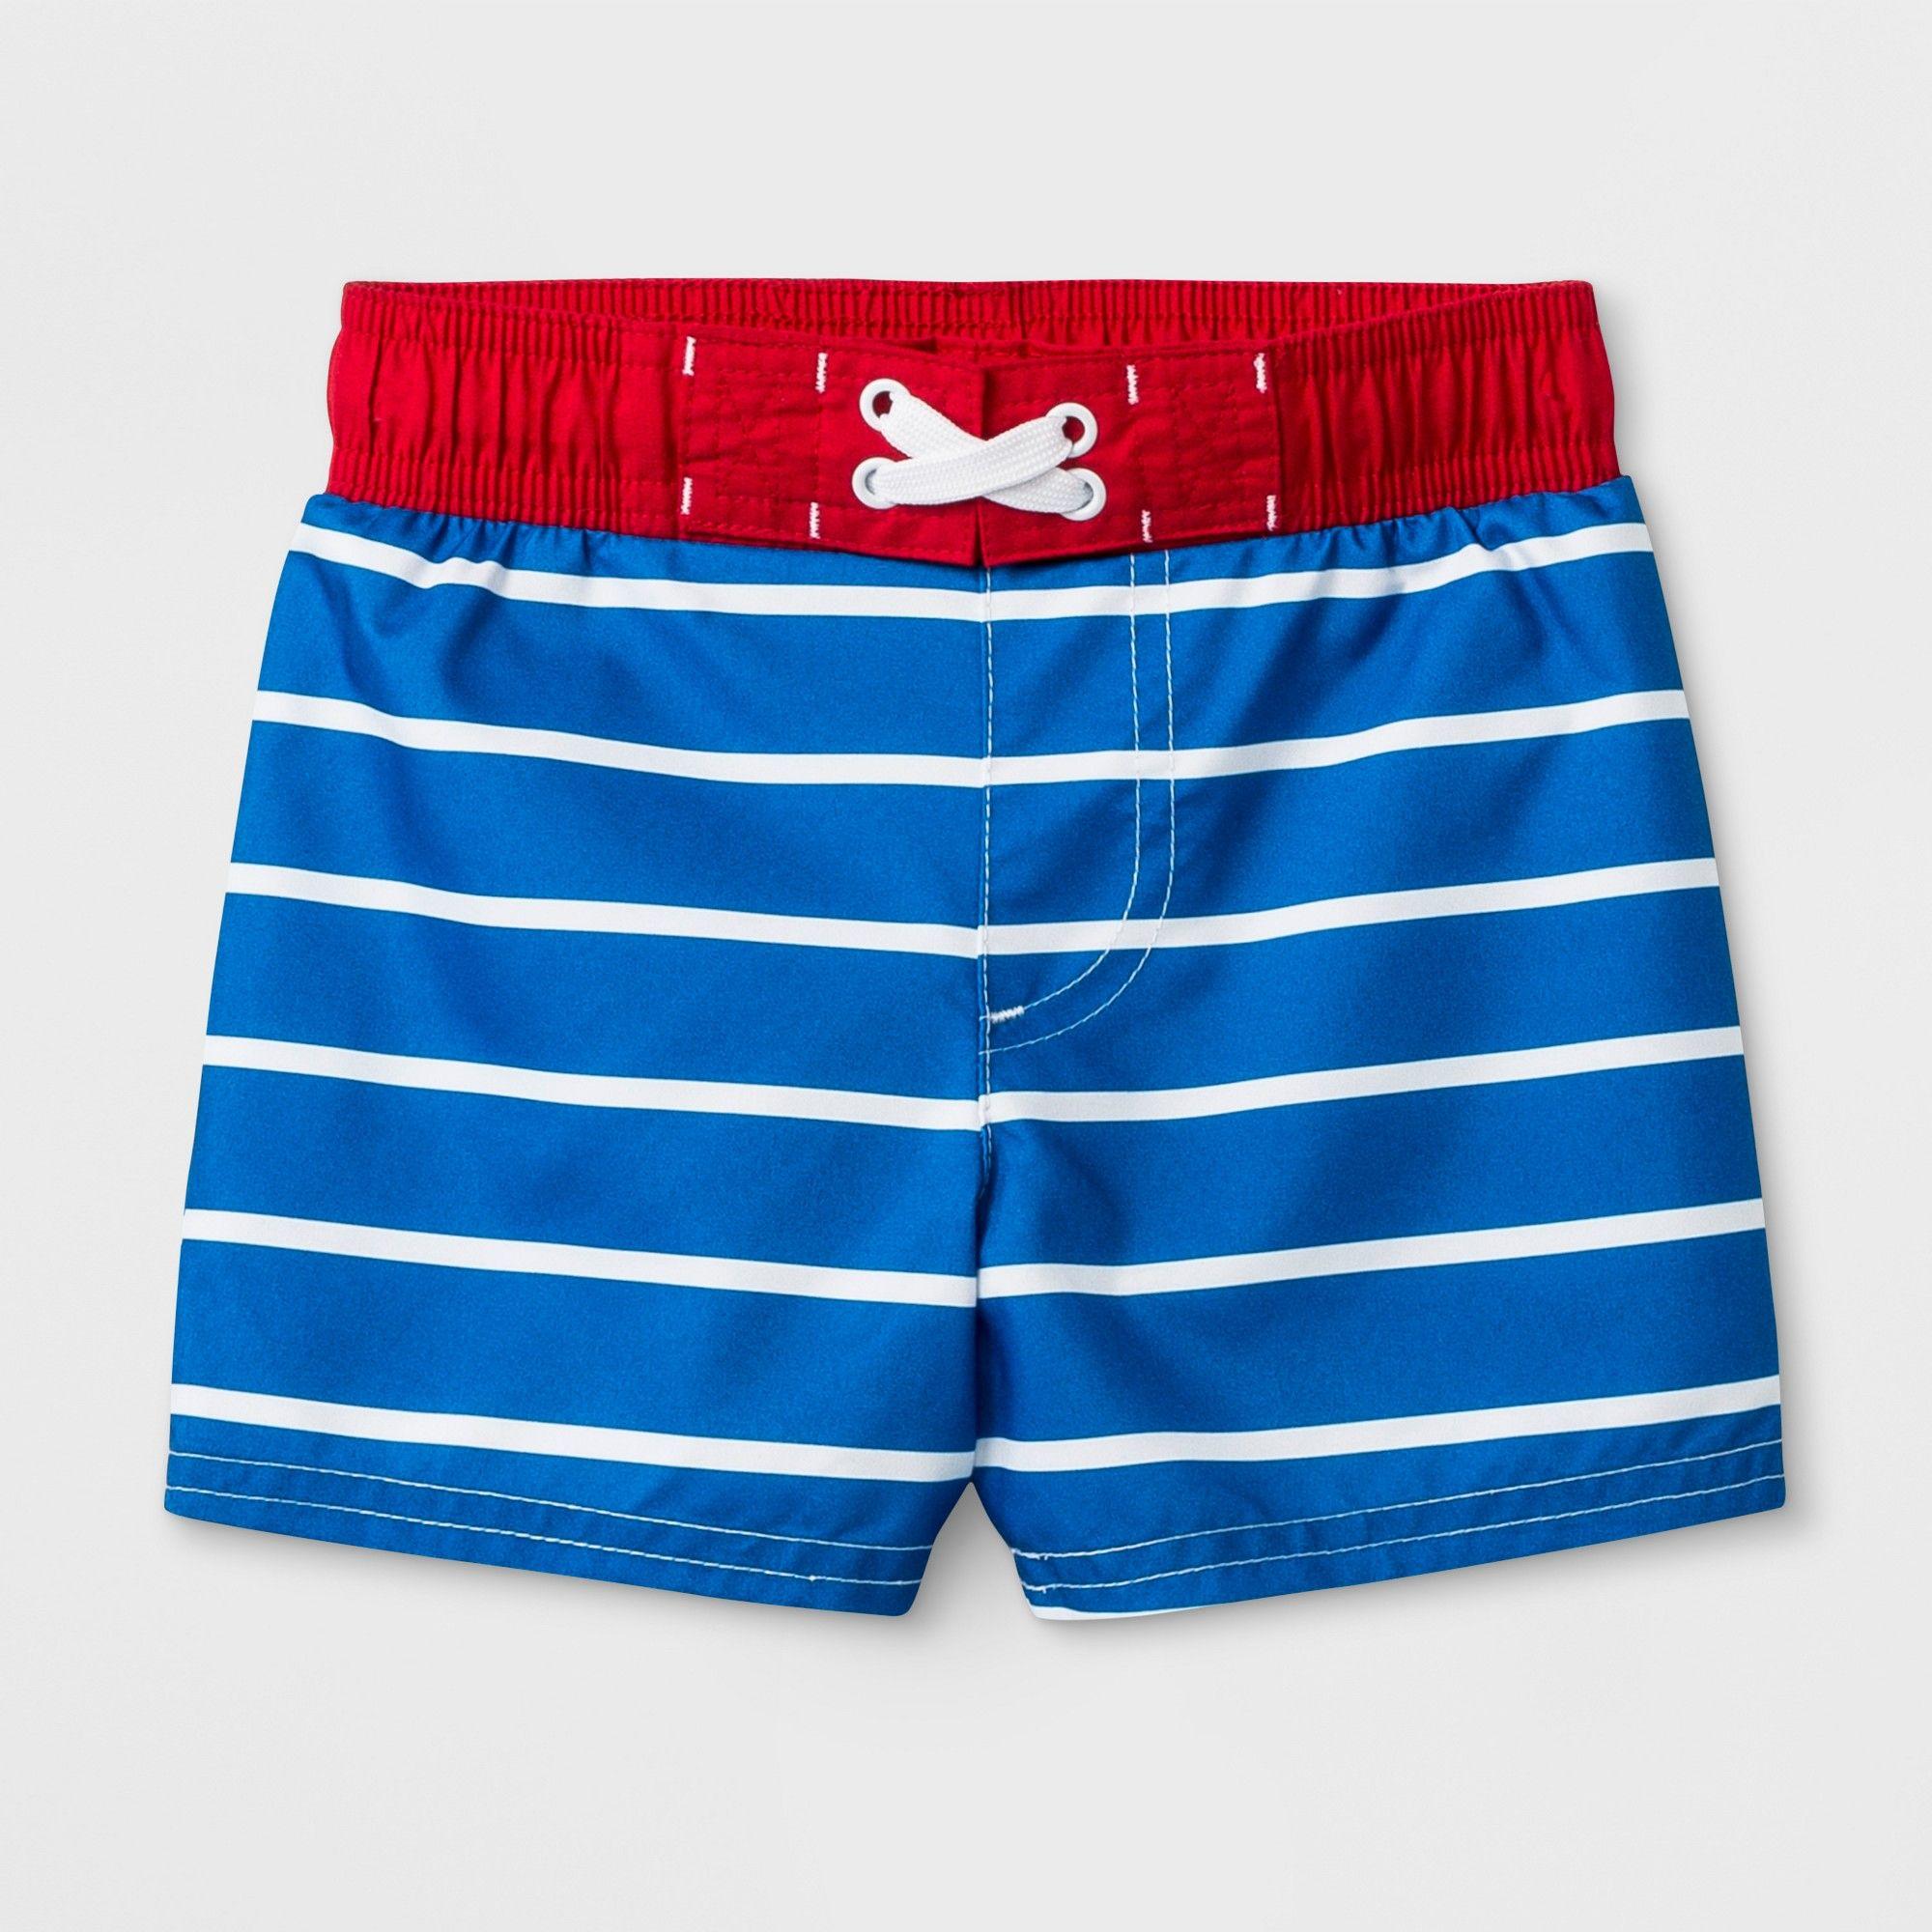 f0f95451e4e8c Baby Boys' Striped Swim Trunks - Cat & Jack Blue 12M | Products ...